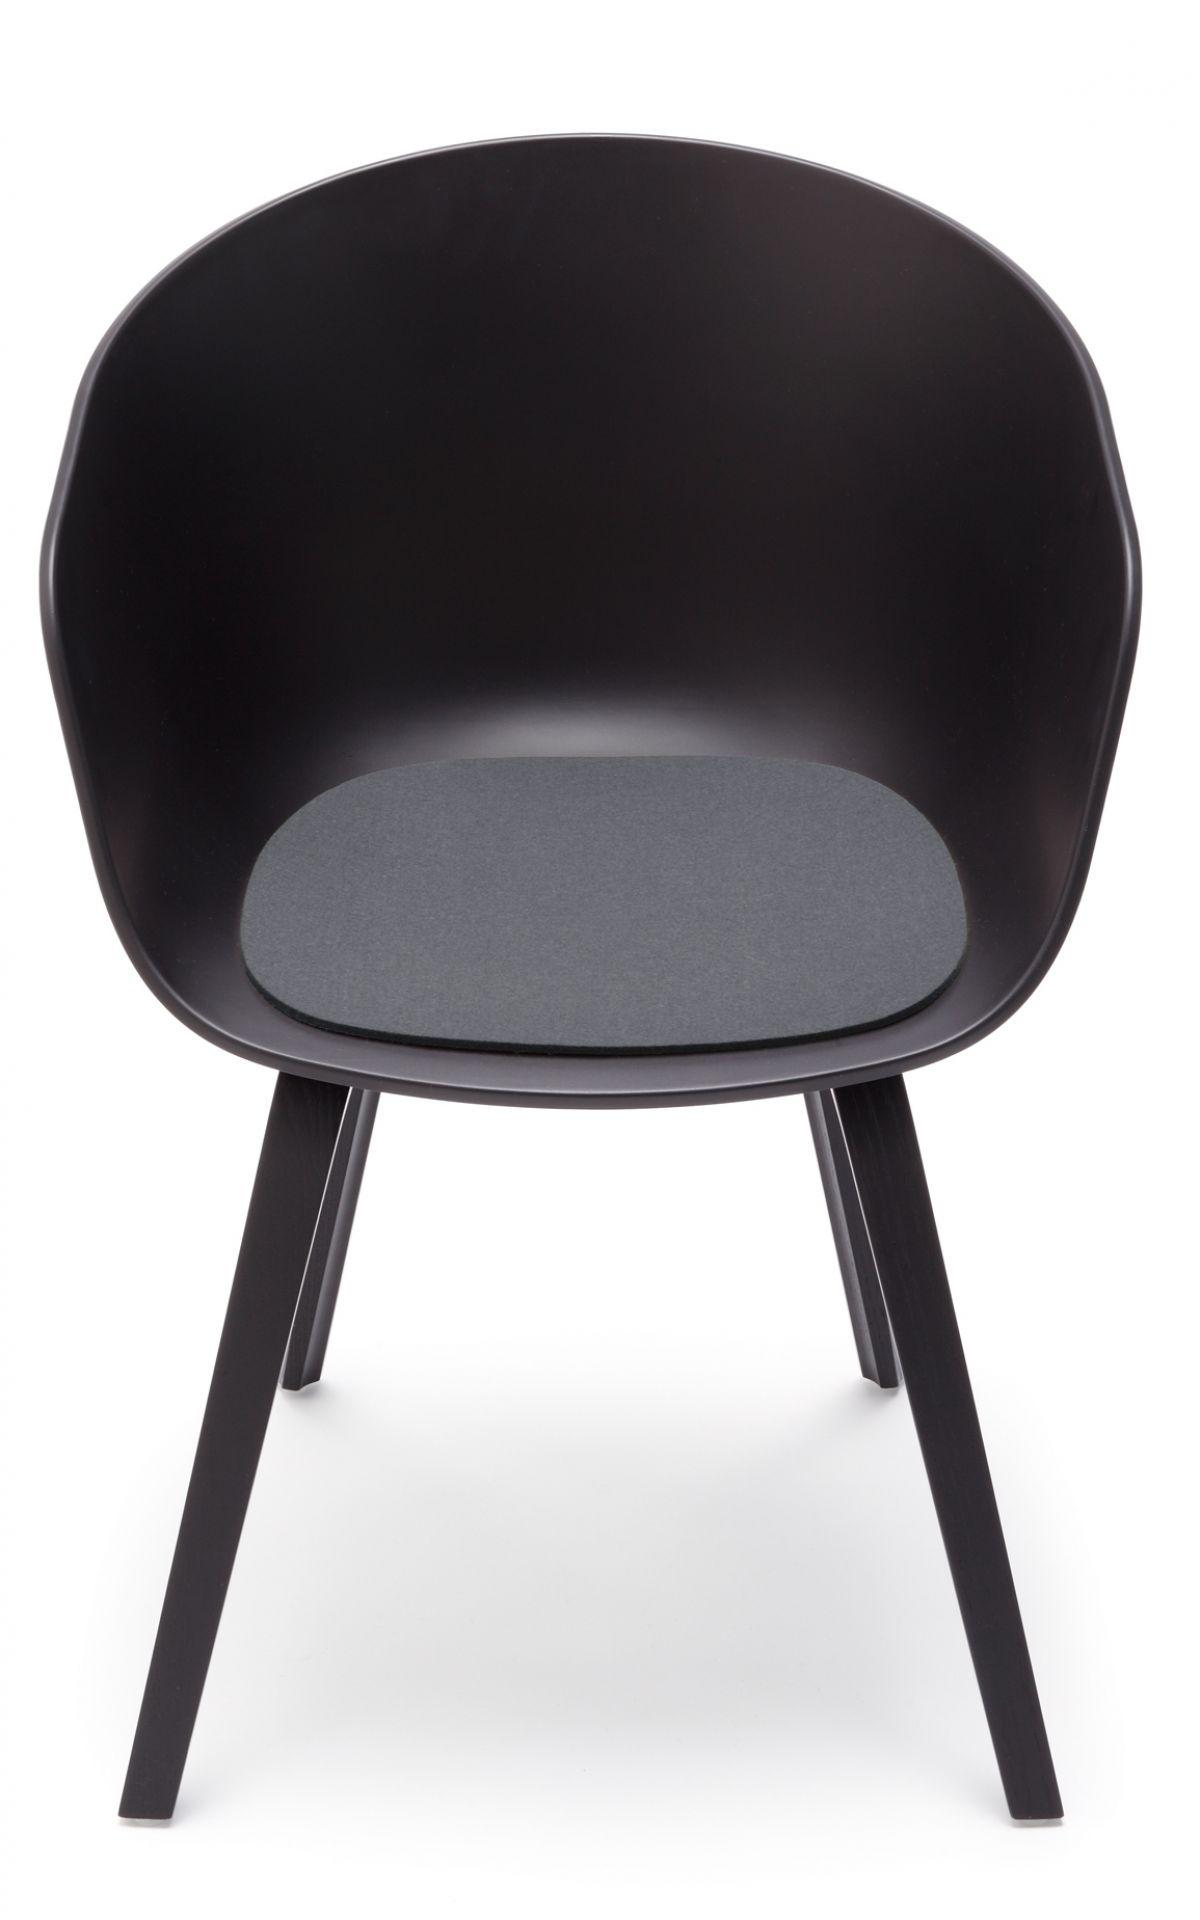 Sitzauflage - Filzauflage About A Chair AAC22 / AAC 22 Taubengrau Hey Sign